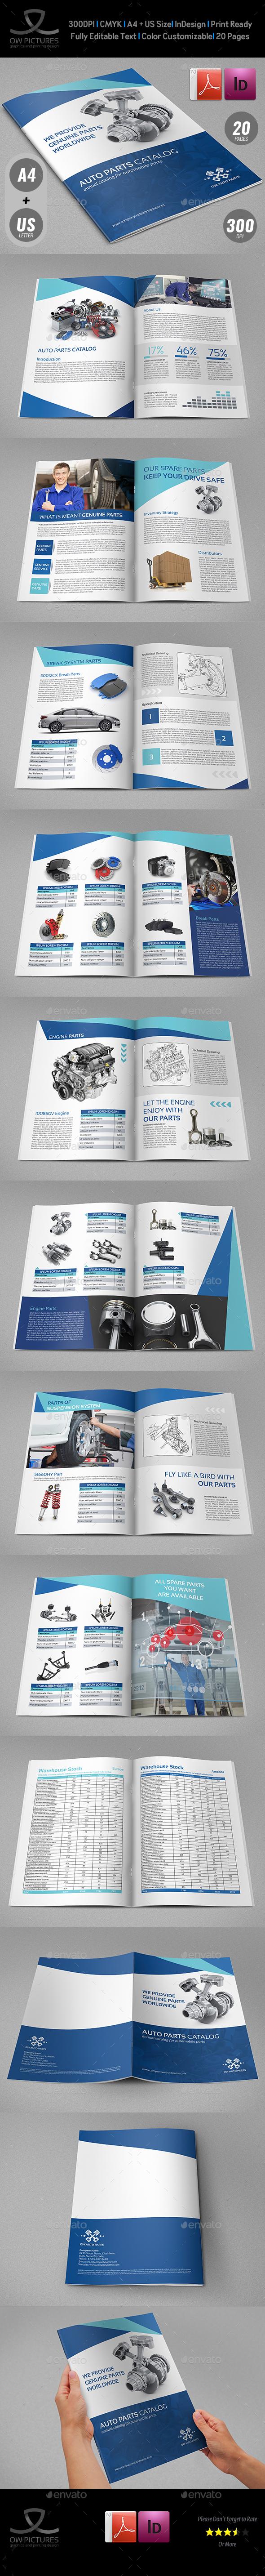 Auto Parts Catalog Brochure Template - 20 Pages - Catalogs Brochures